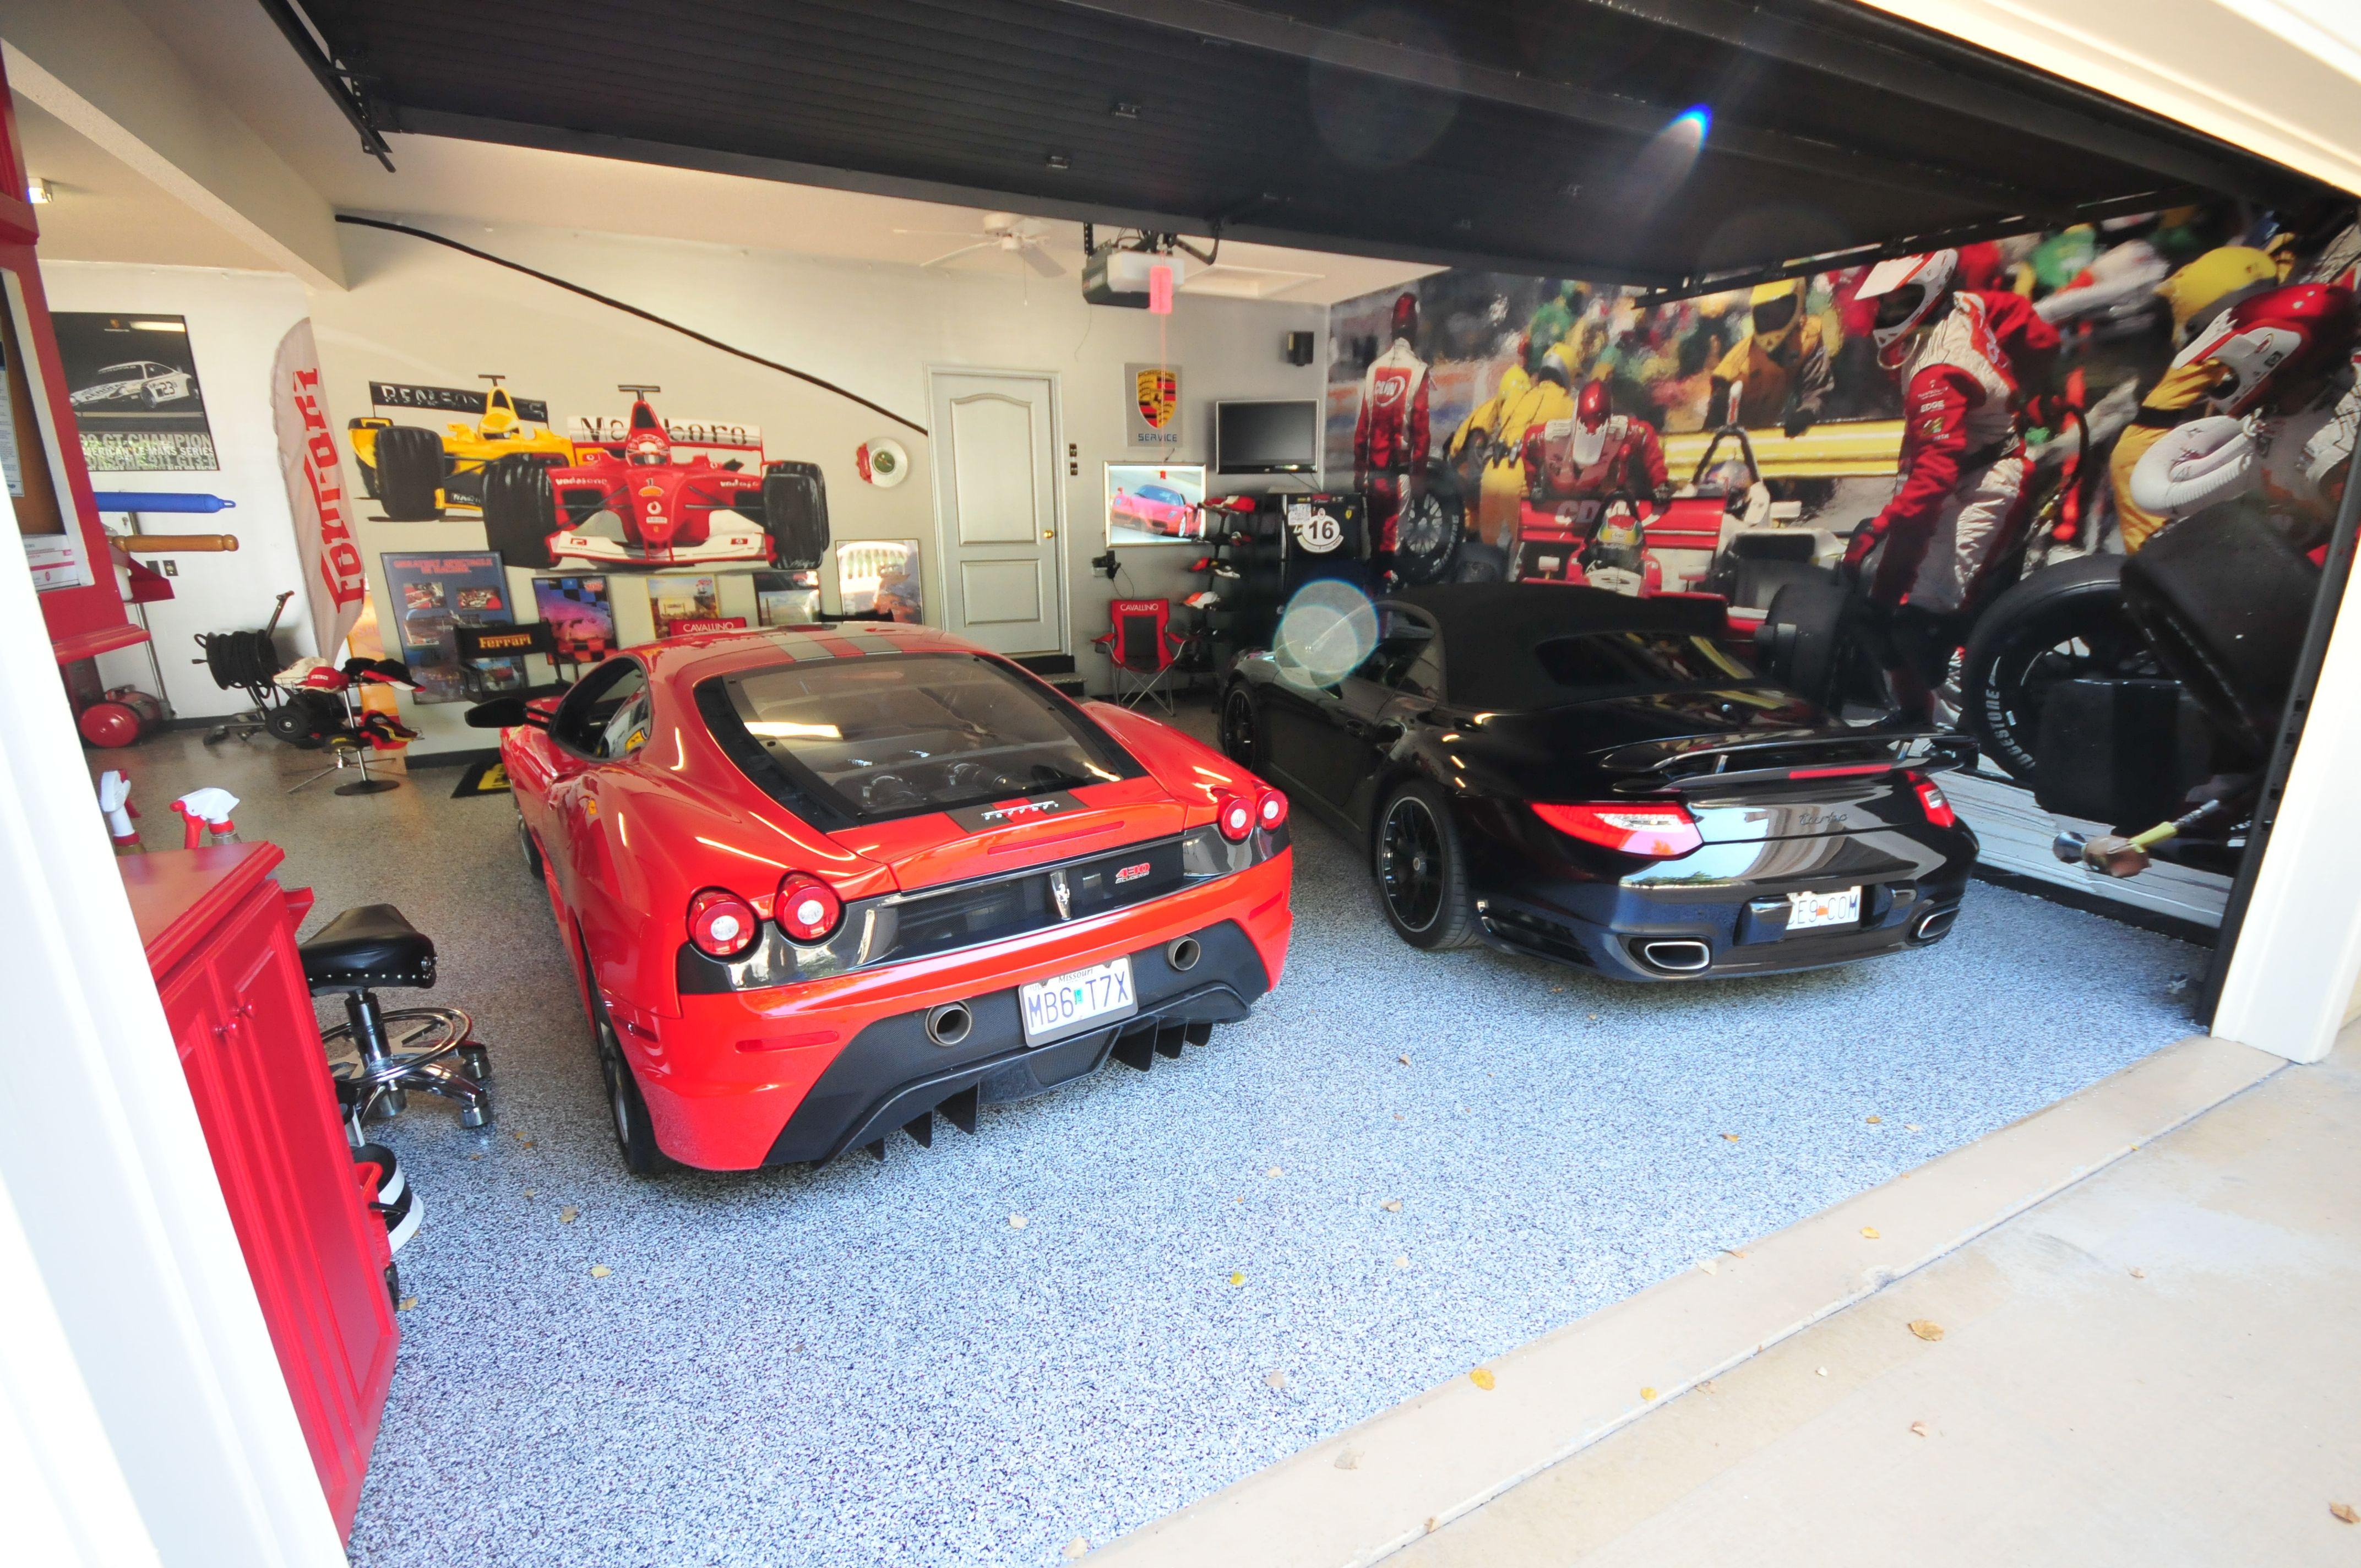 Amazing Garage And Cars Floor